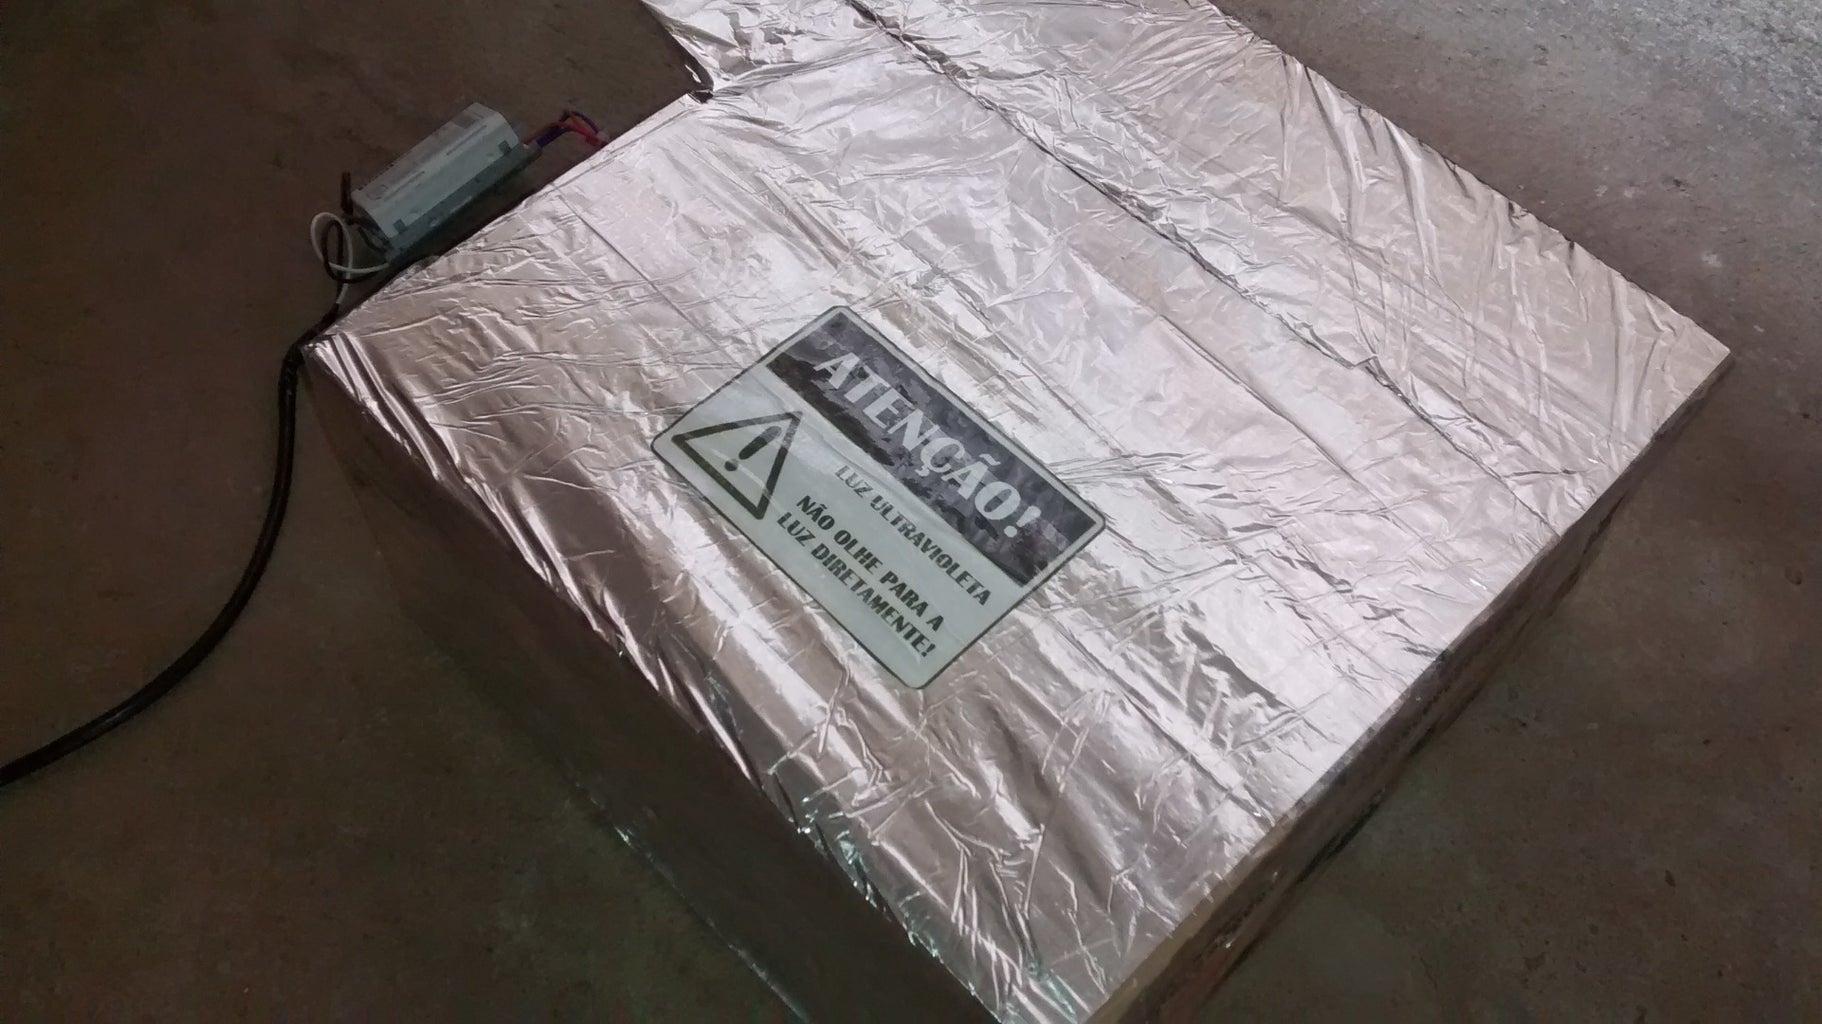 Wrap It in Tinfoil!